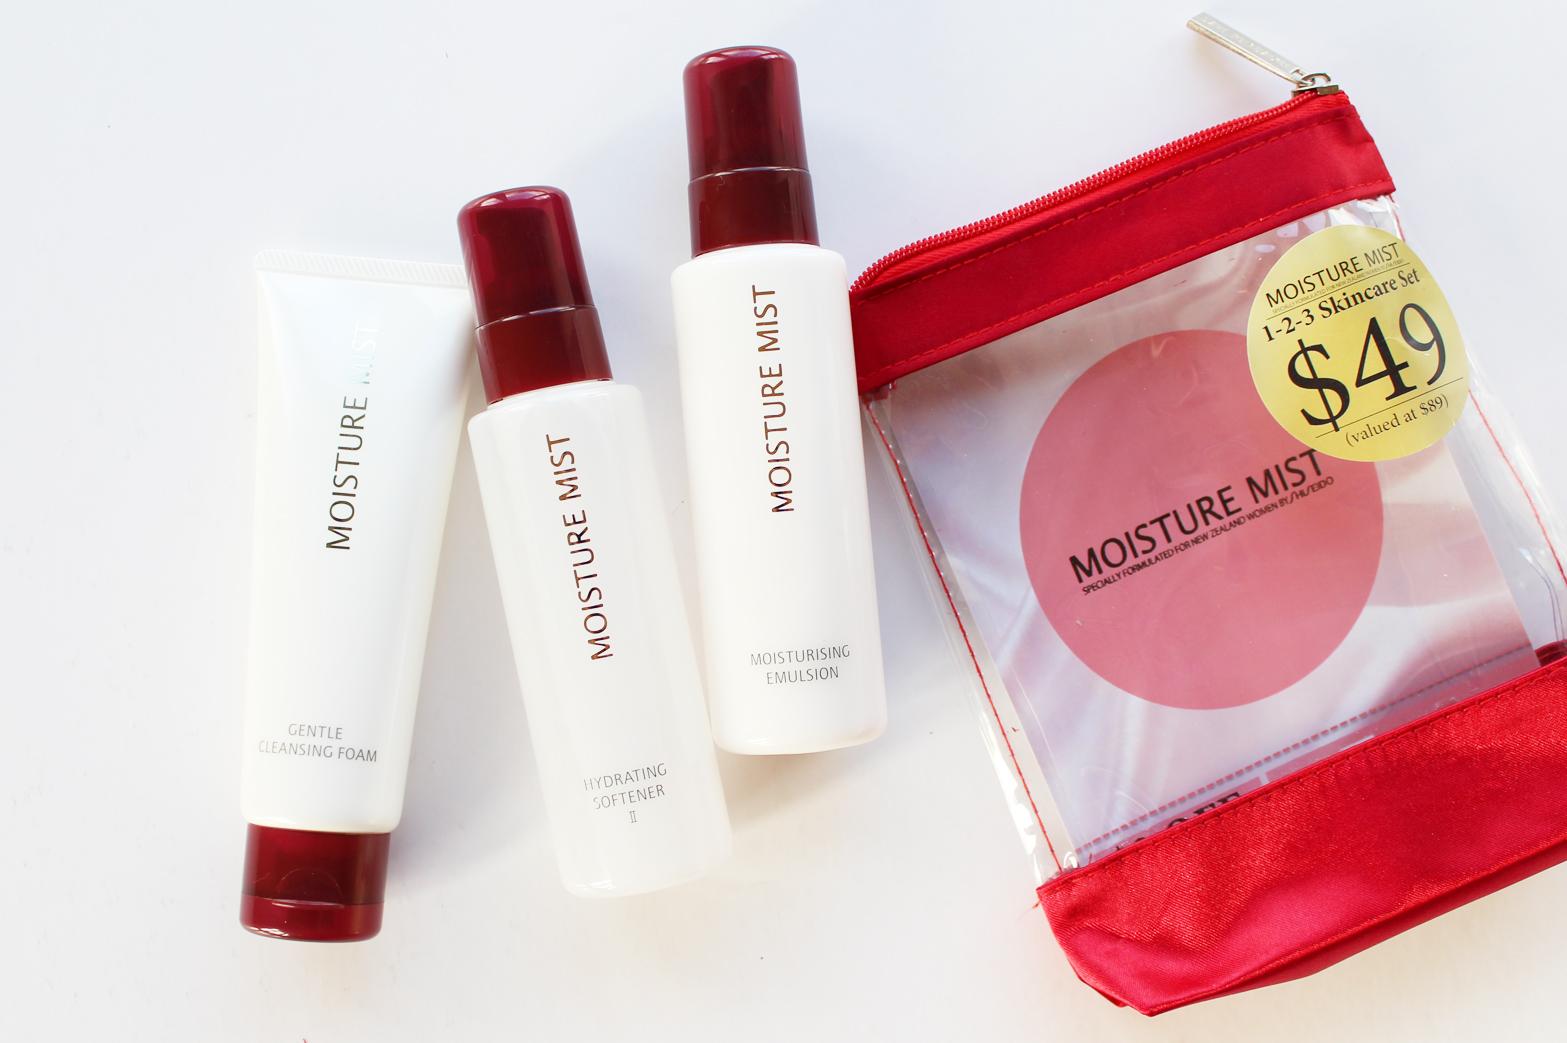 MOISTURE MIST + ZA | Mother's Day Gift Sets - CassandraMyee